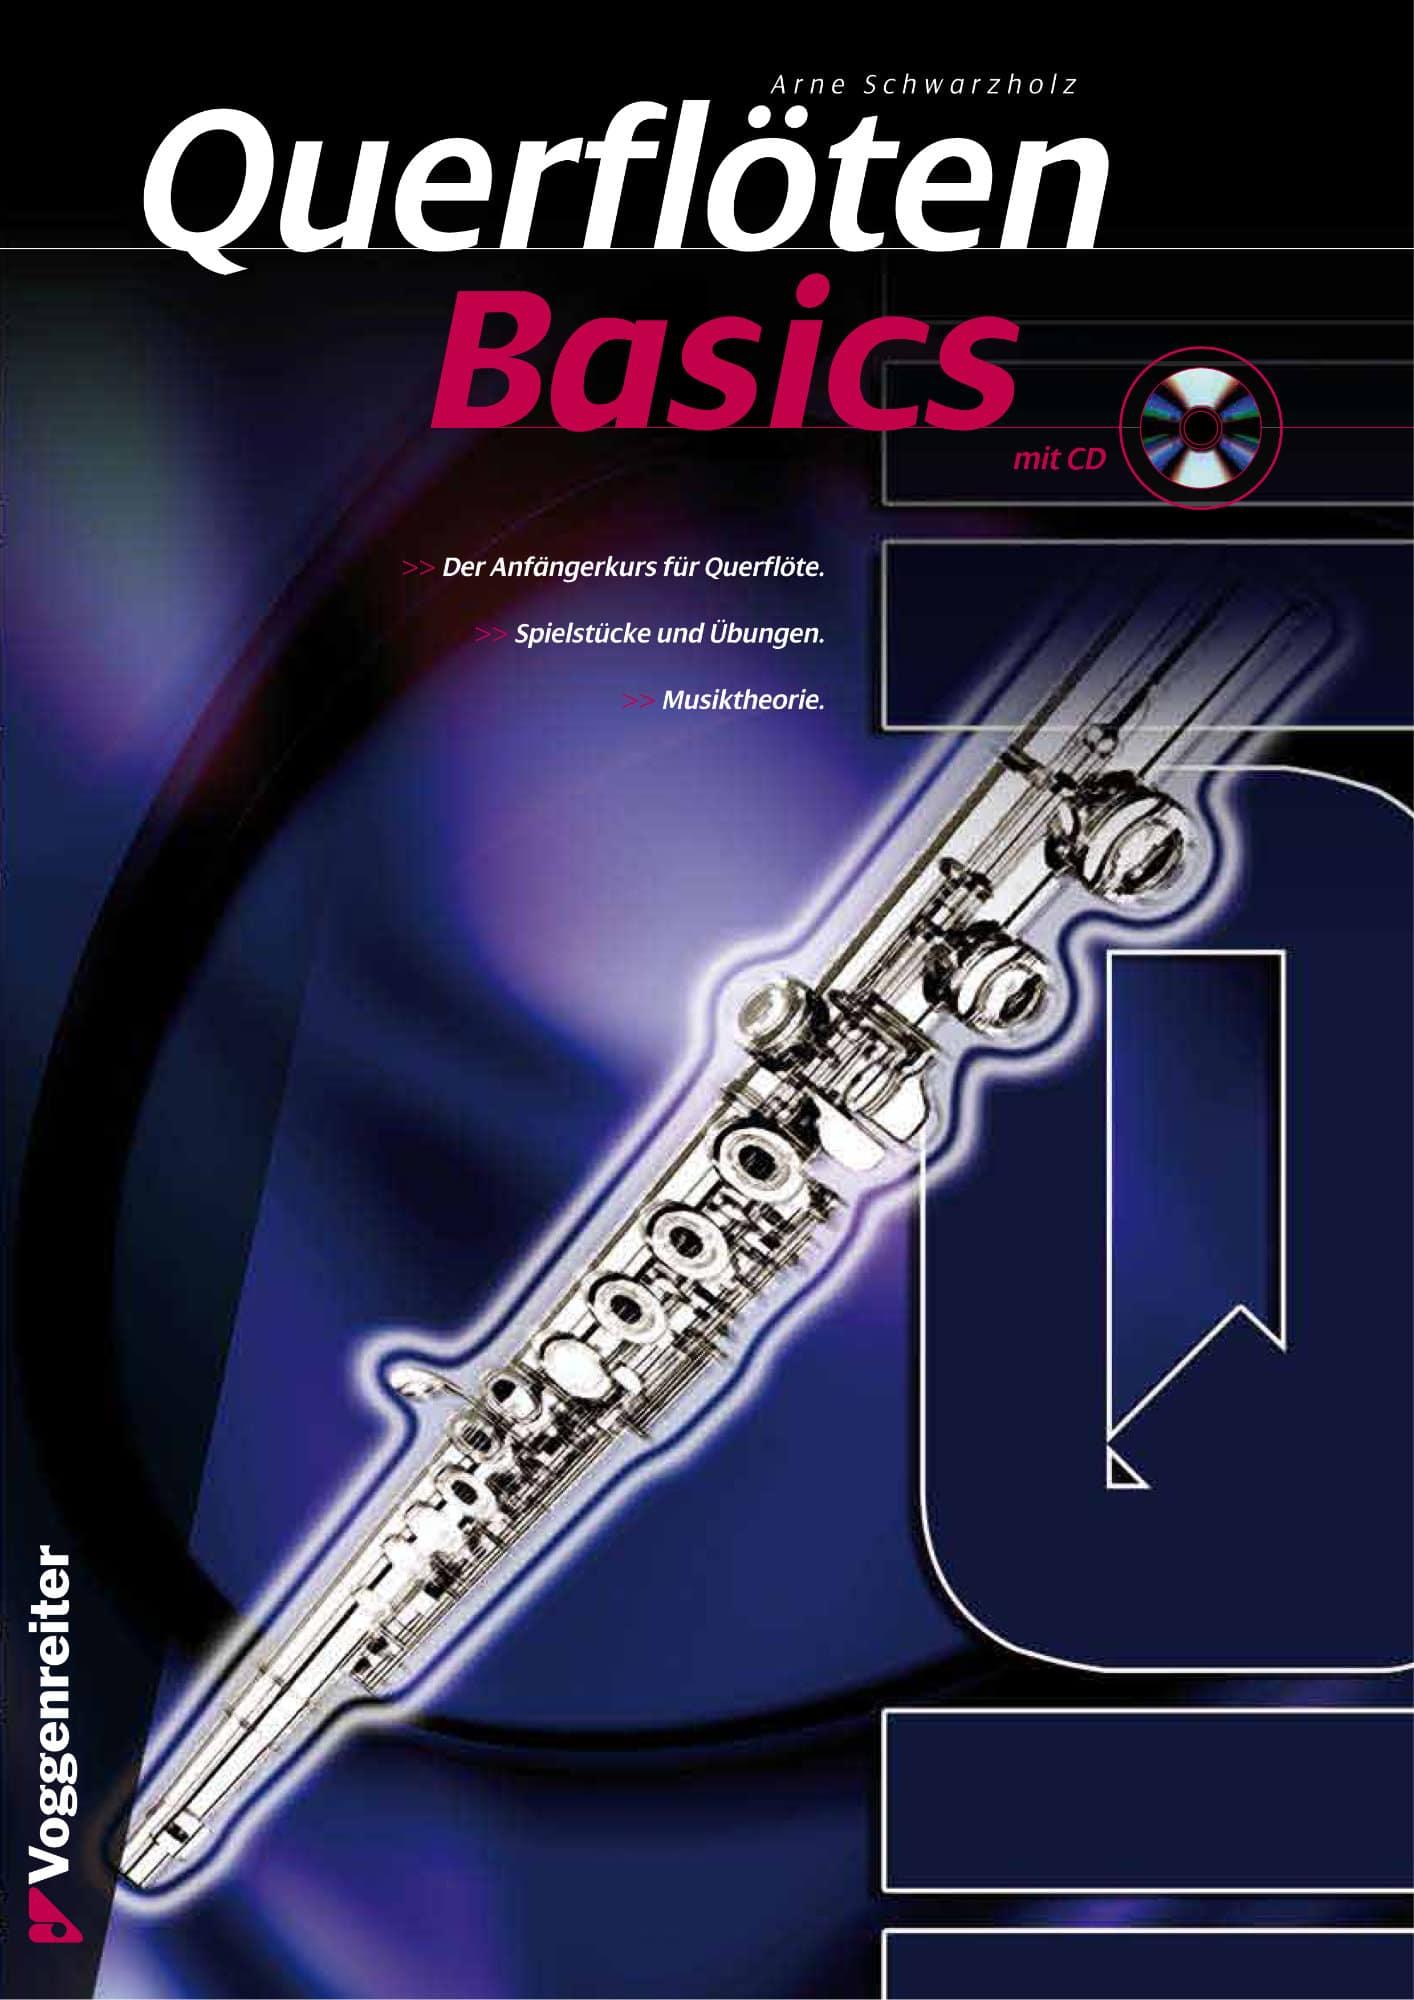 Floetelernen - Querflöten Basics CD - Onlineshop Musikhaus Kirstein